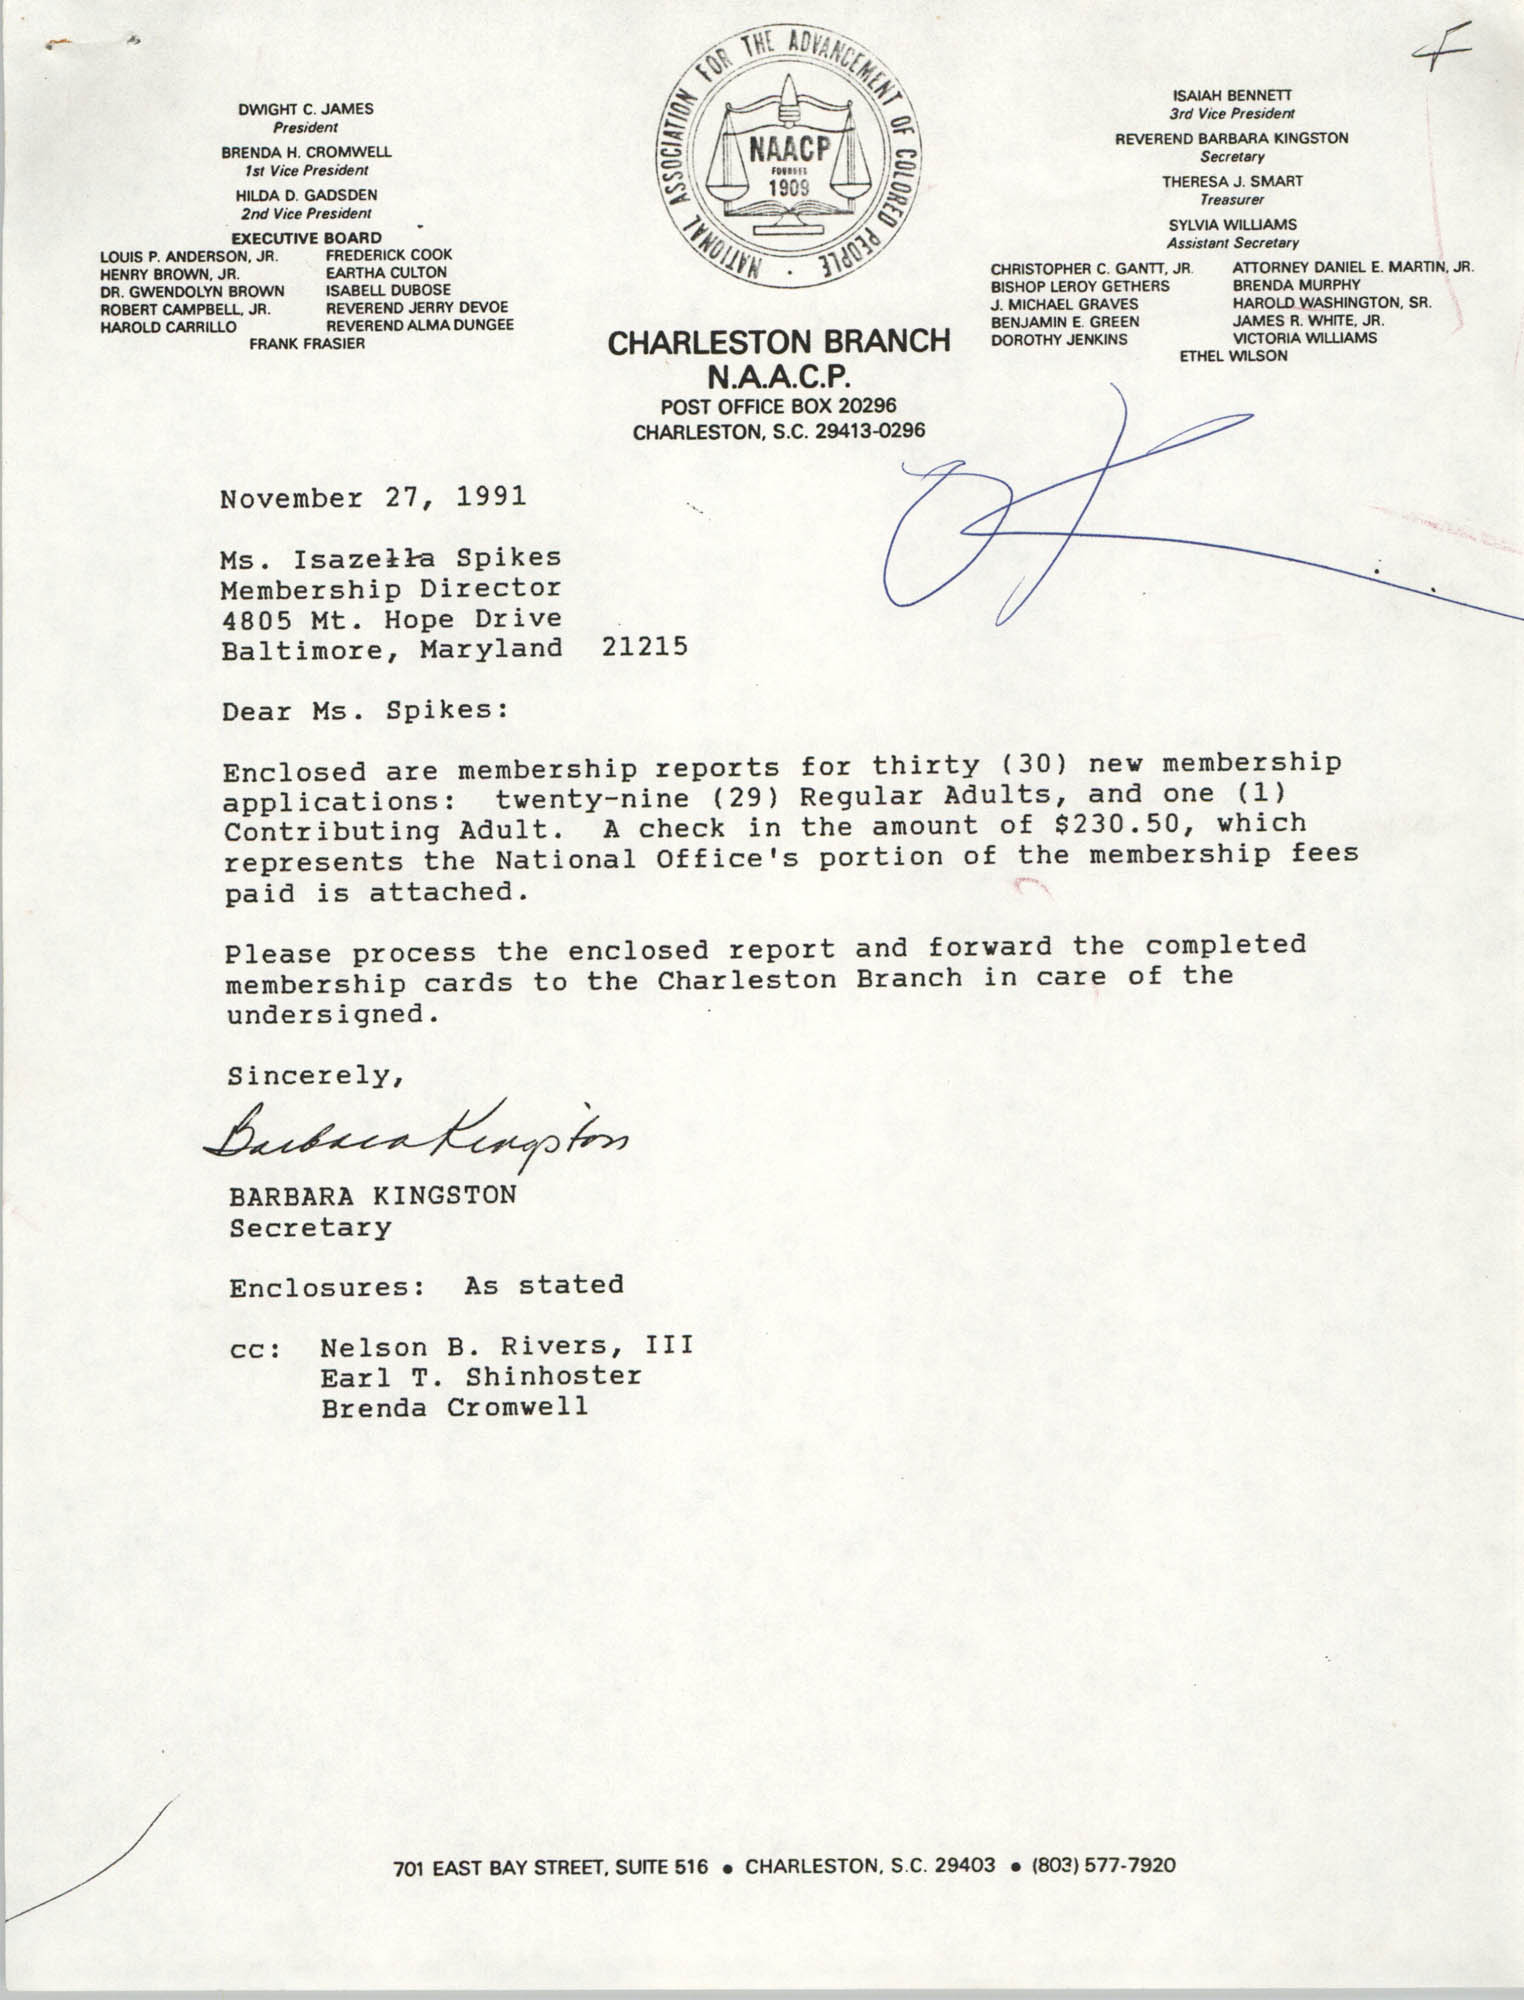 Letter from Barbara Kingston to Isazetta Spikes, November 27, 1991